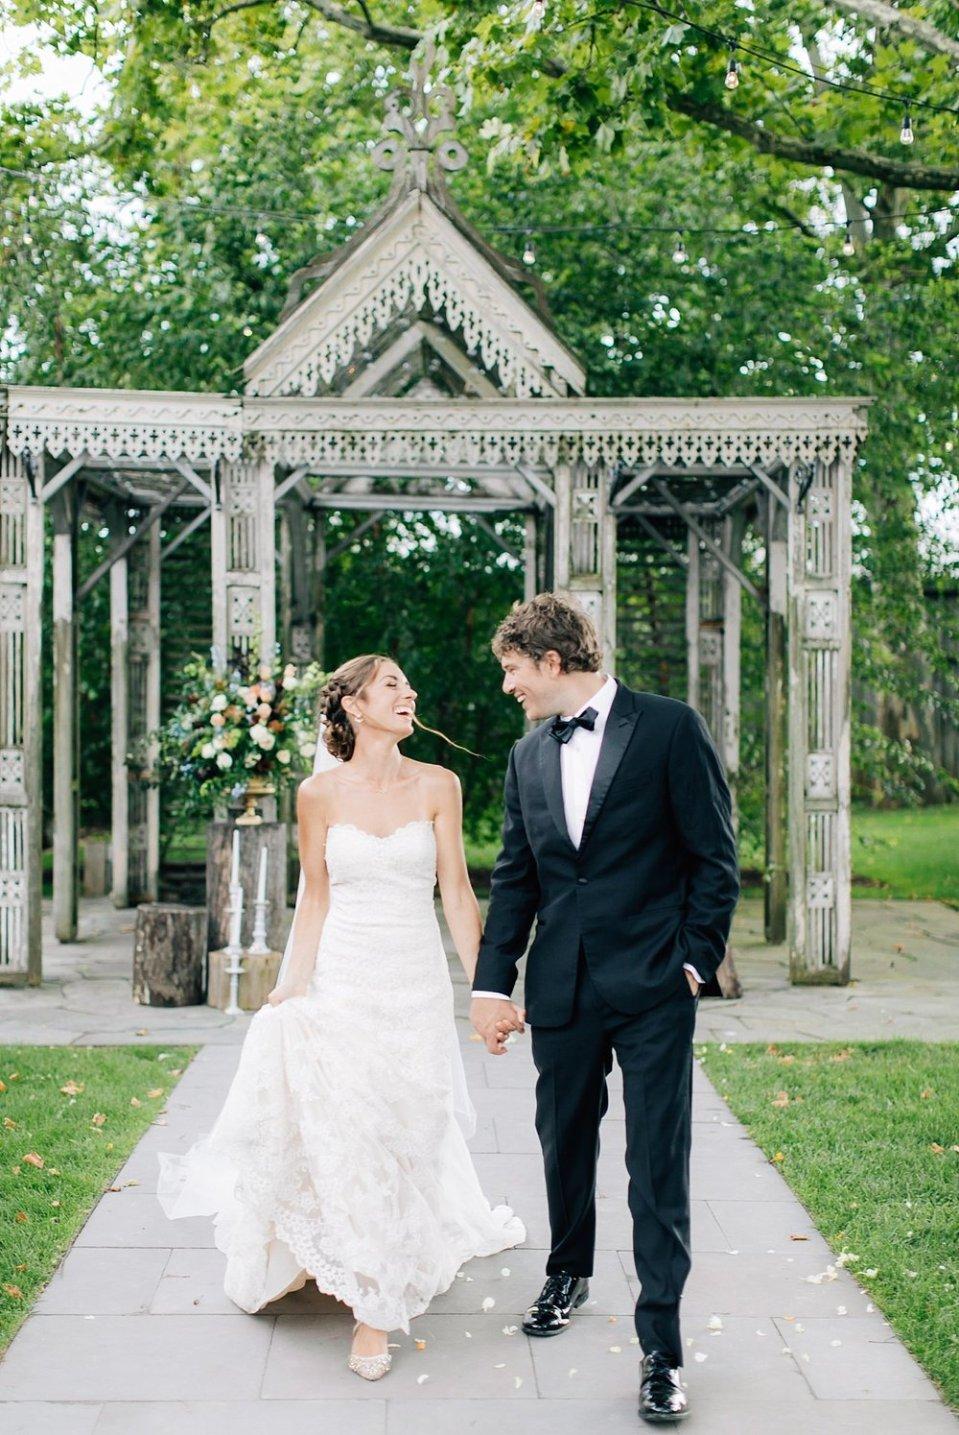 terrain gatherings glen mills pa romantic garden wedding photography magdalena studios 0047